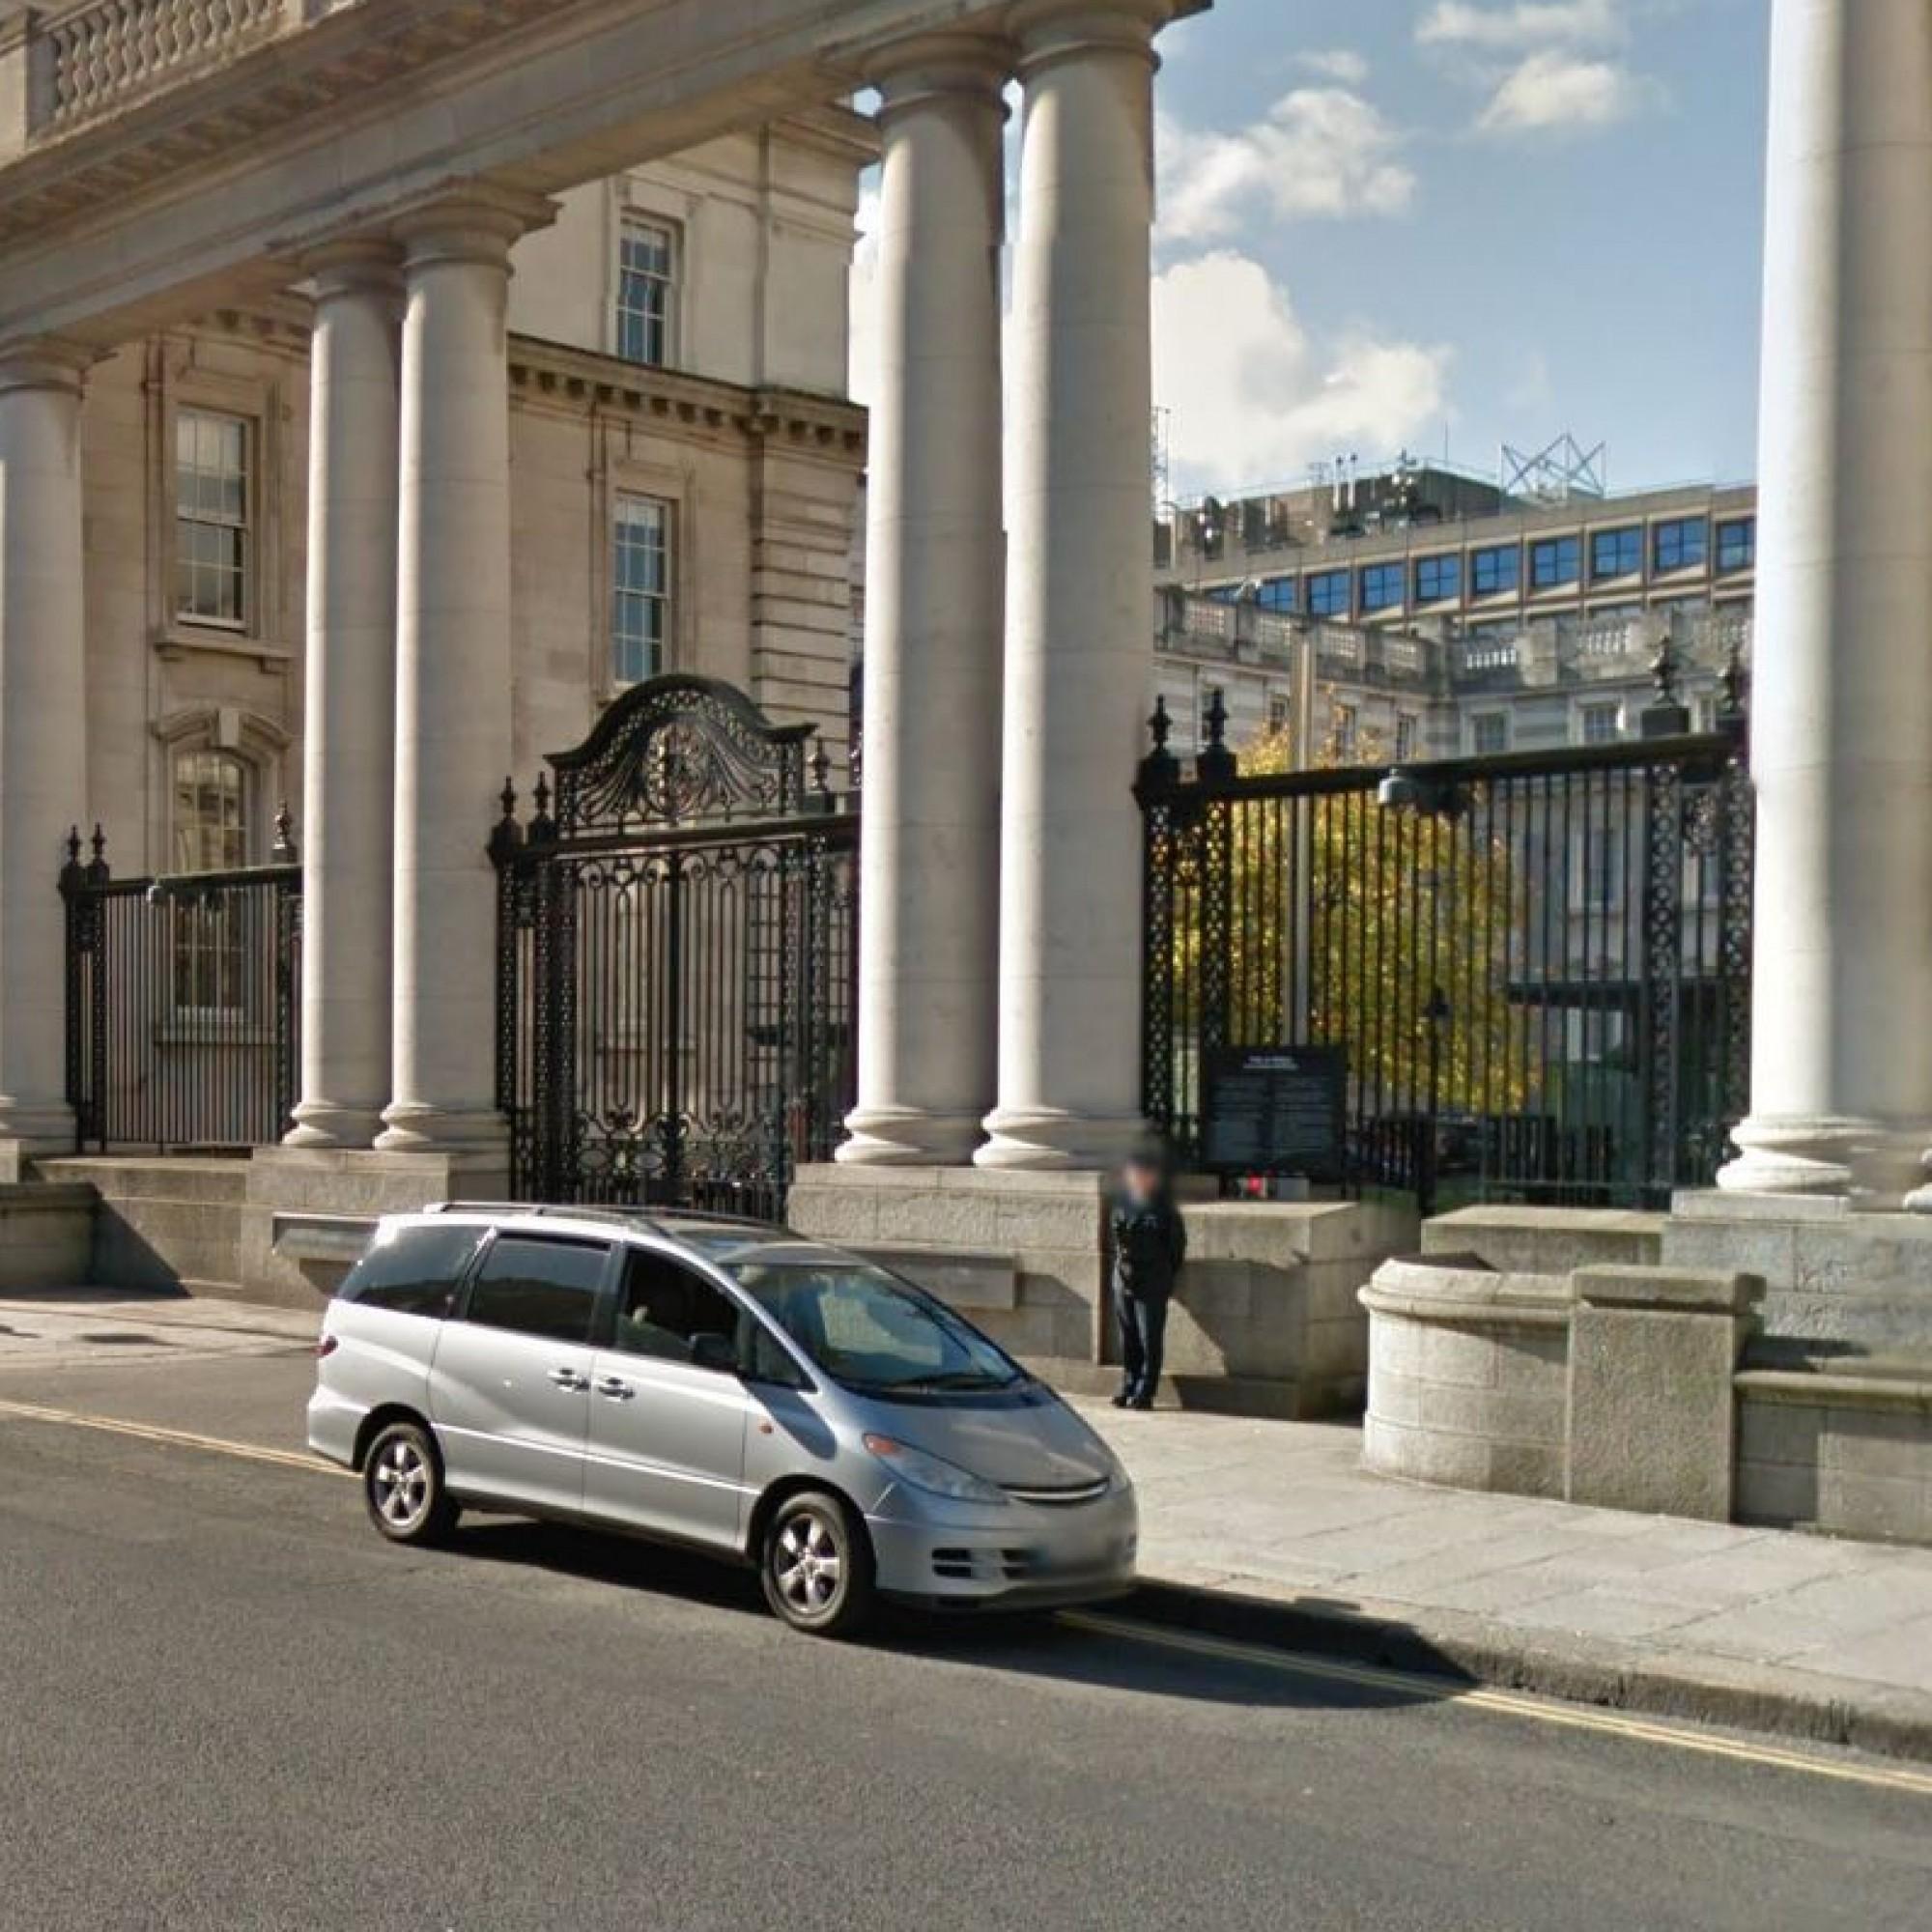 Security alert at Dáil �ireann as man blocks main entrance to government buildings